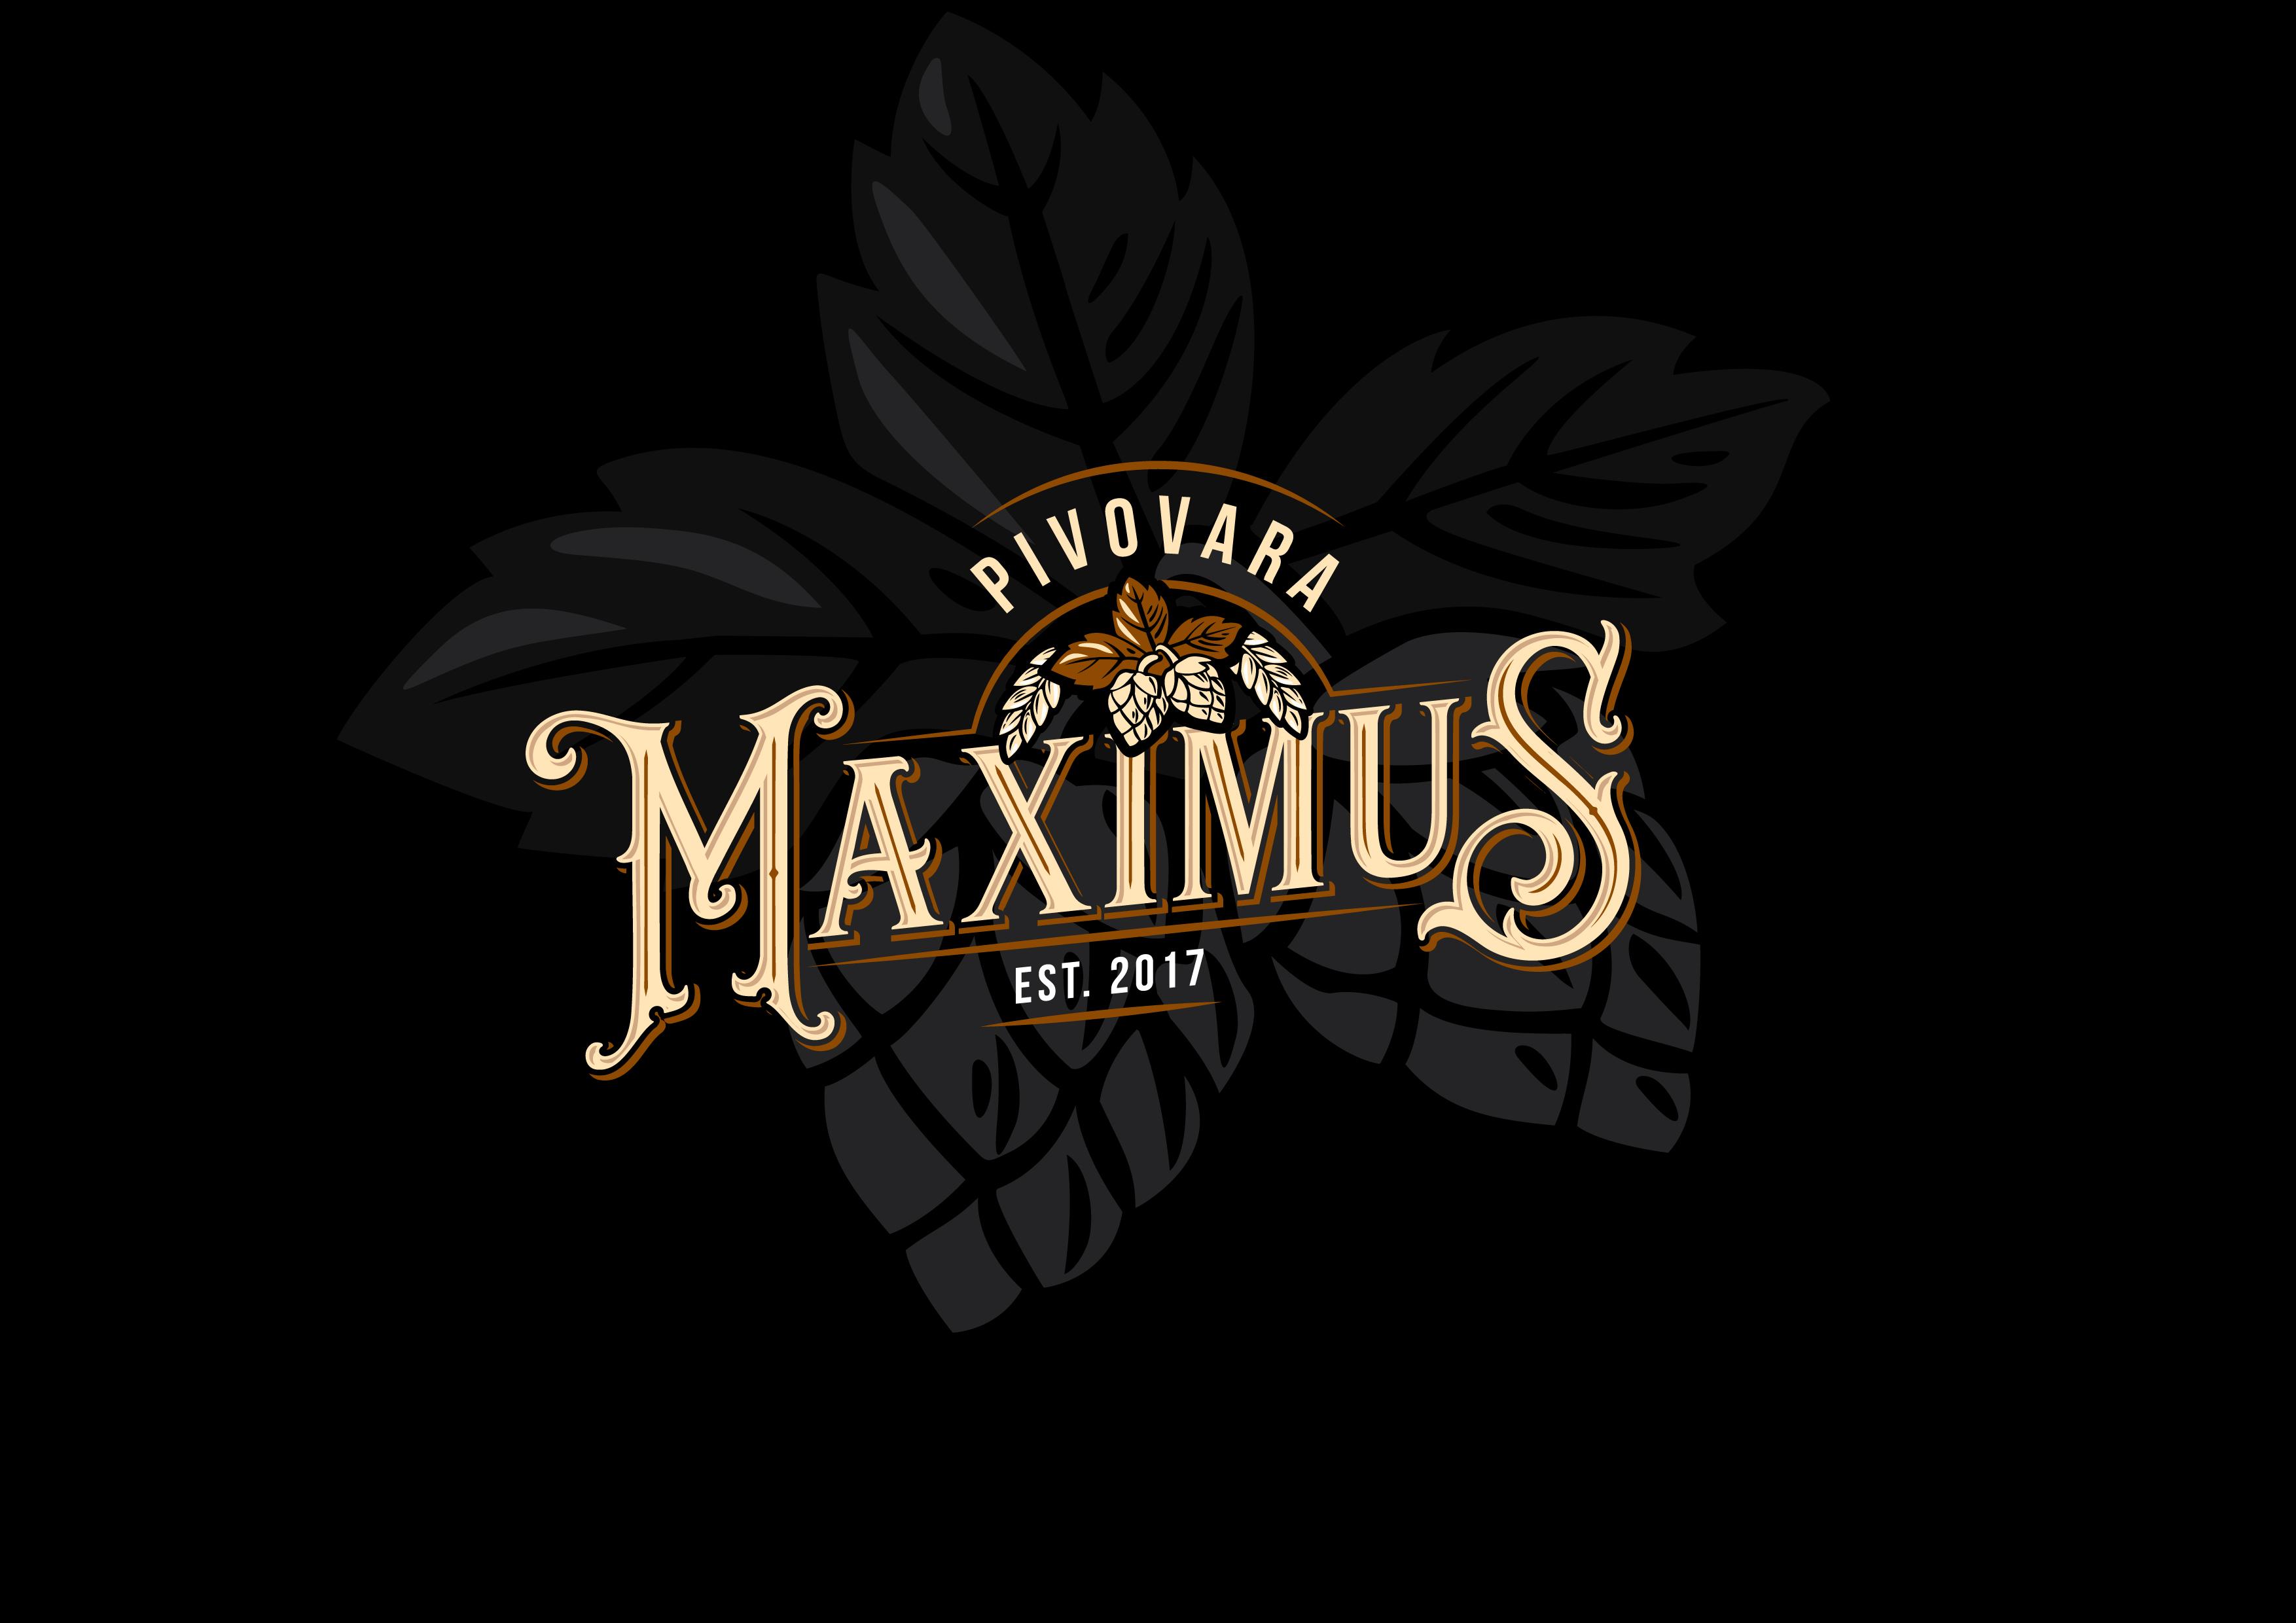 Maximus Brewery logo